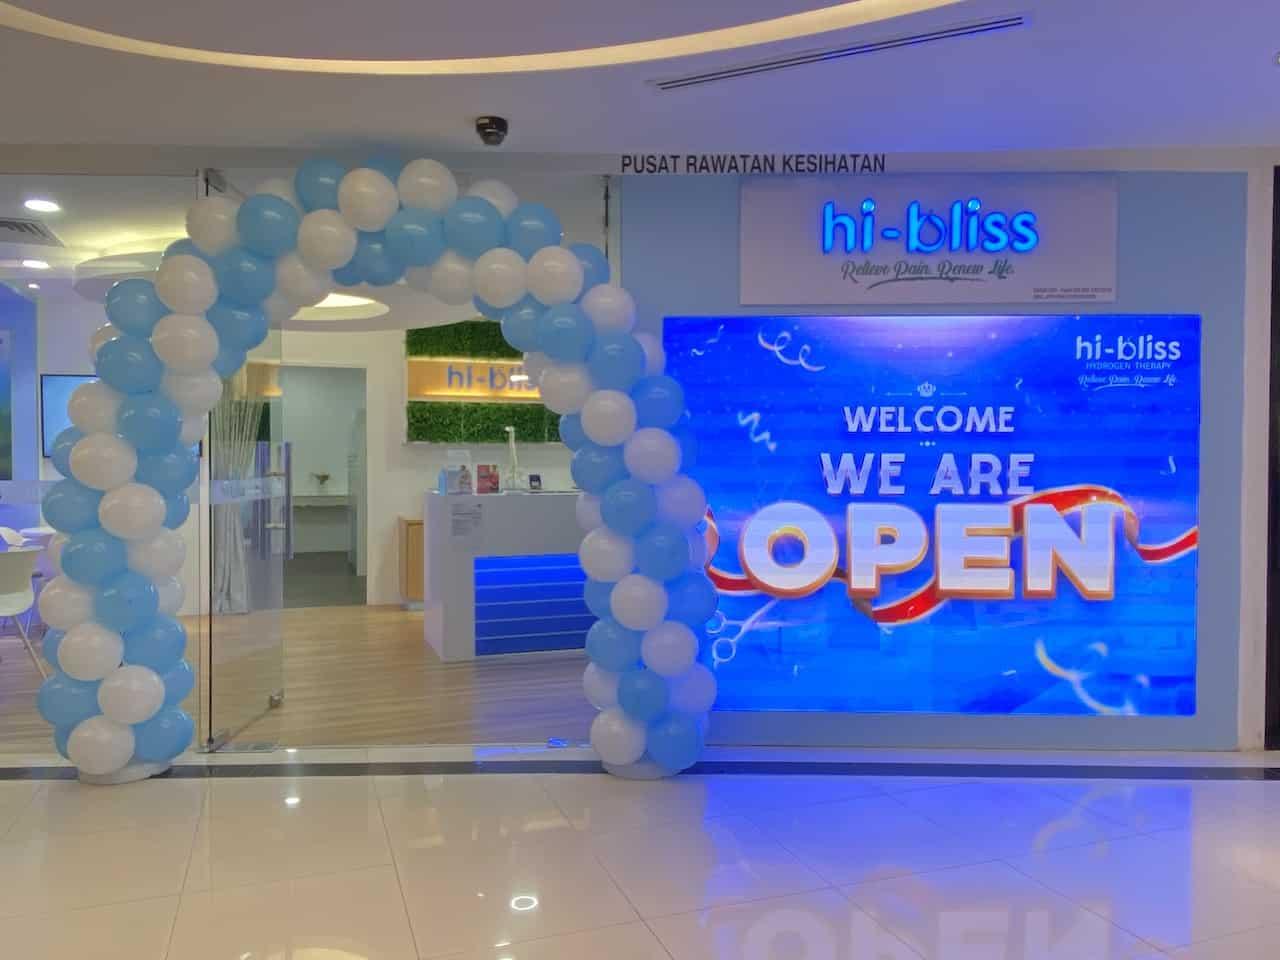 hi-bliss bsc centre